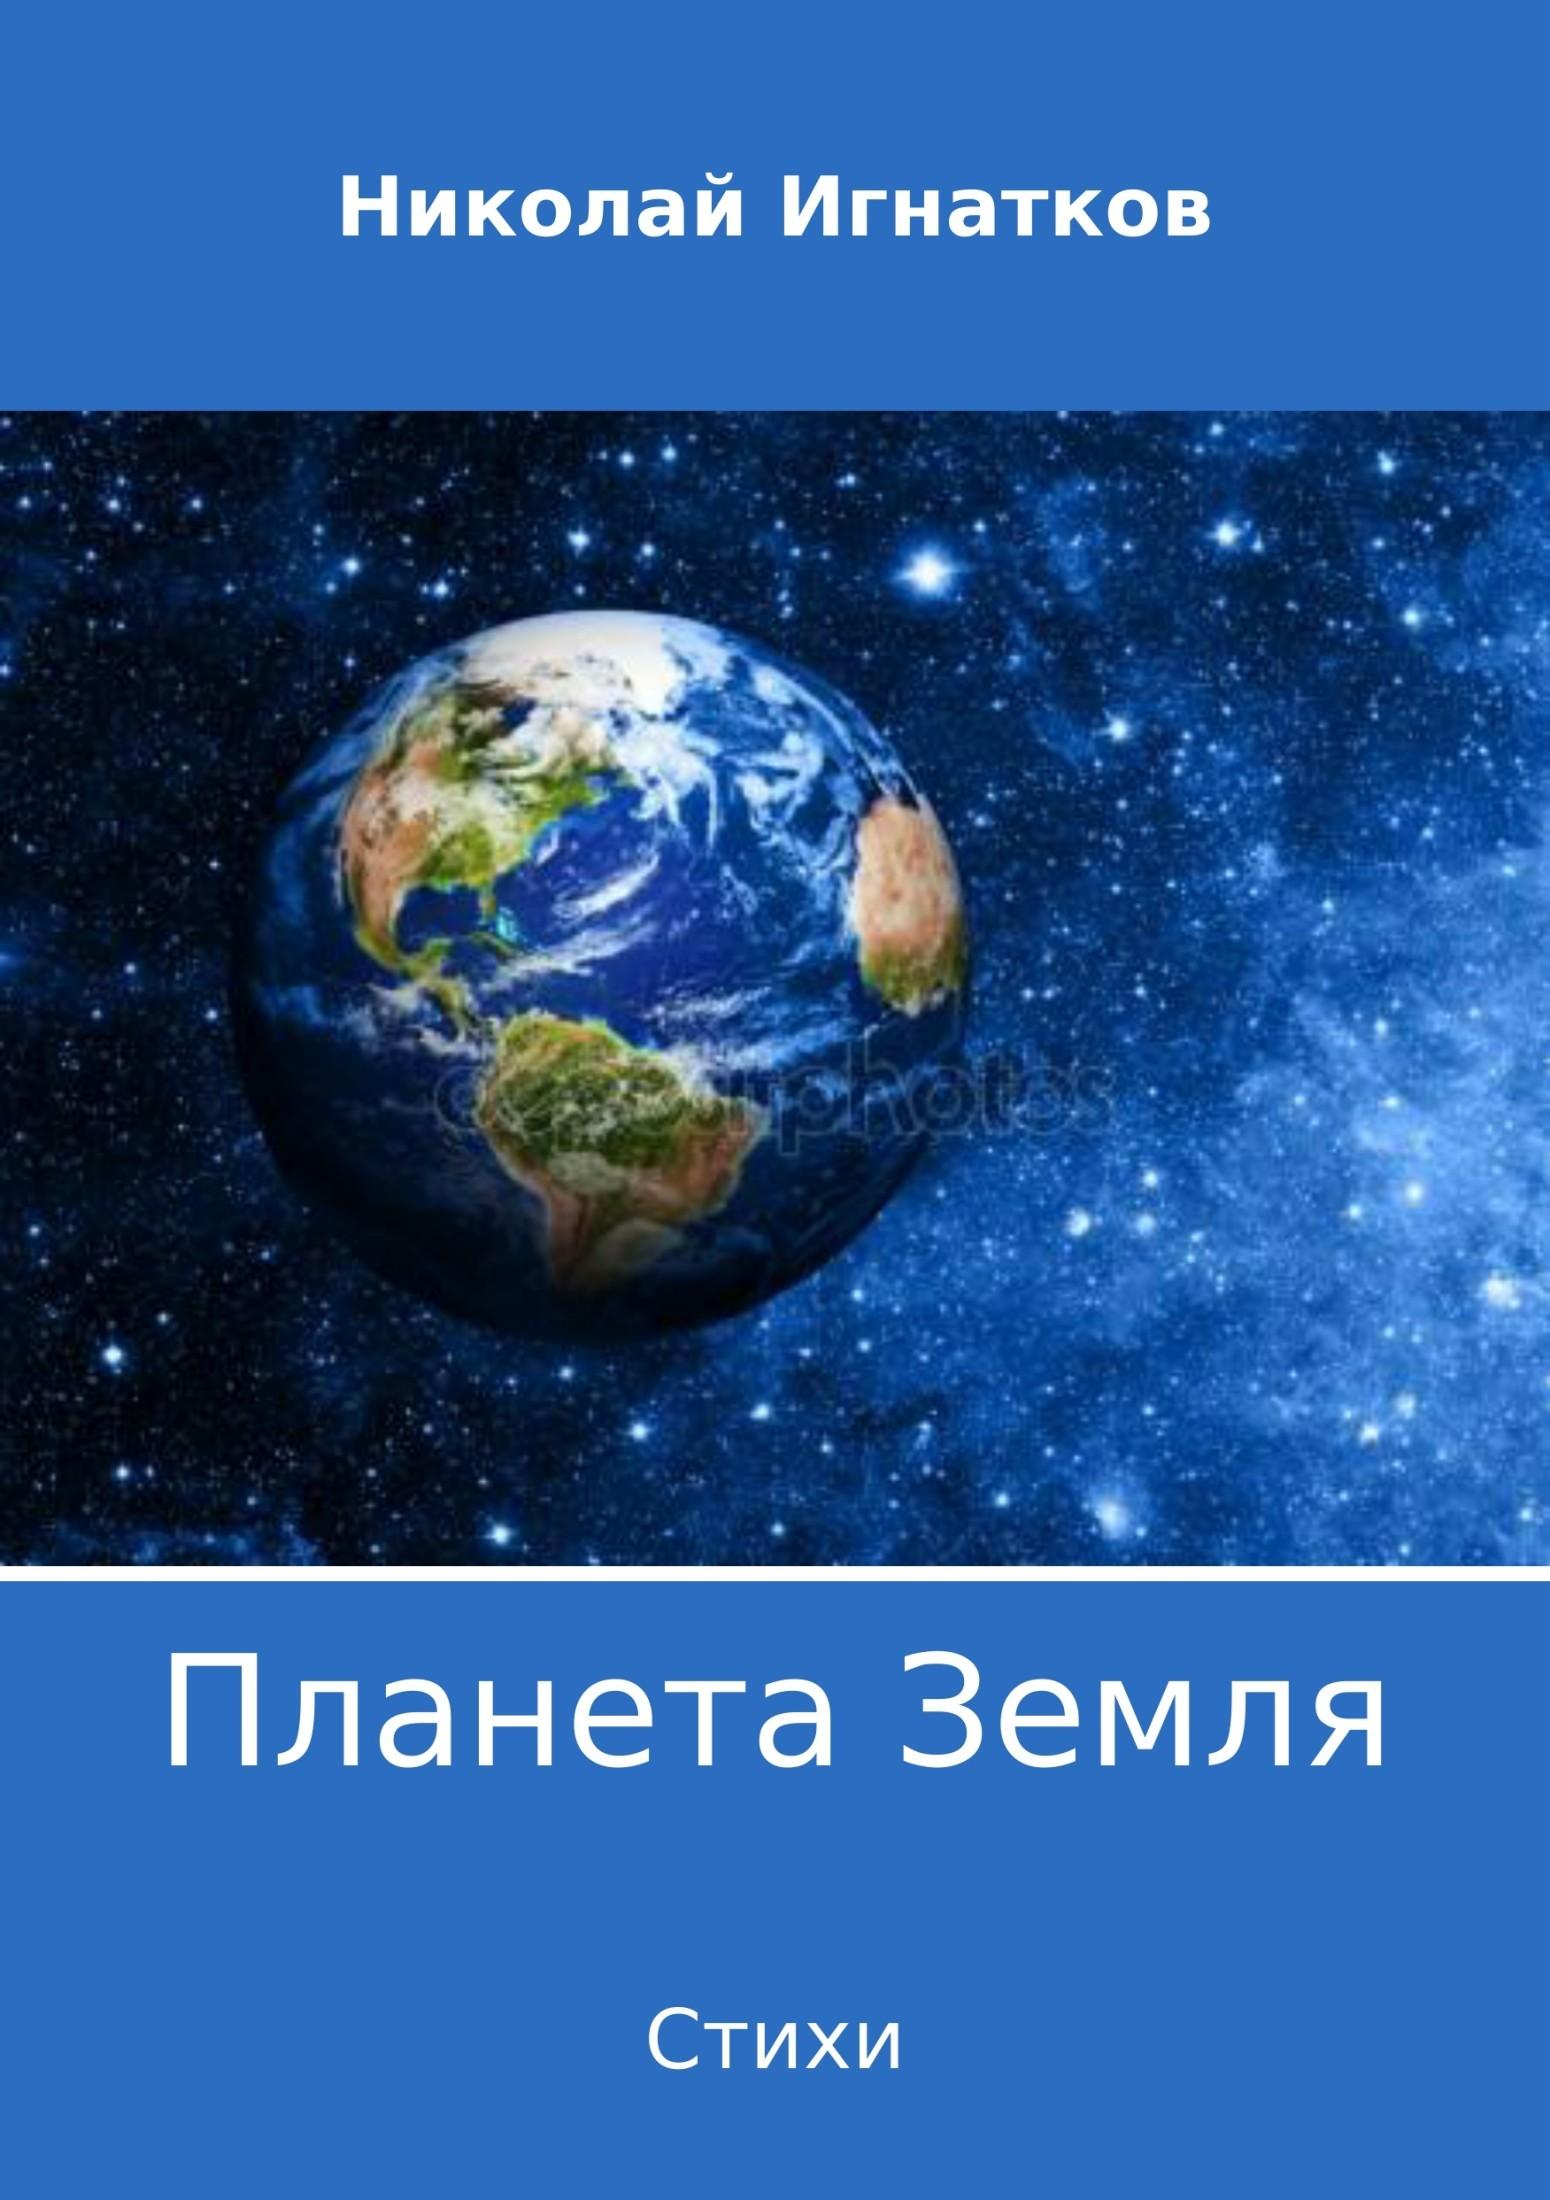 Николай Викторович Игнатков Планета Земля. Сборник стихотворений цена